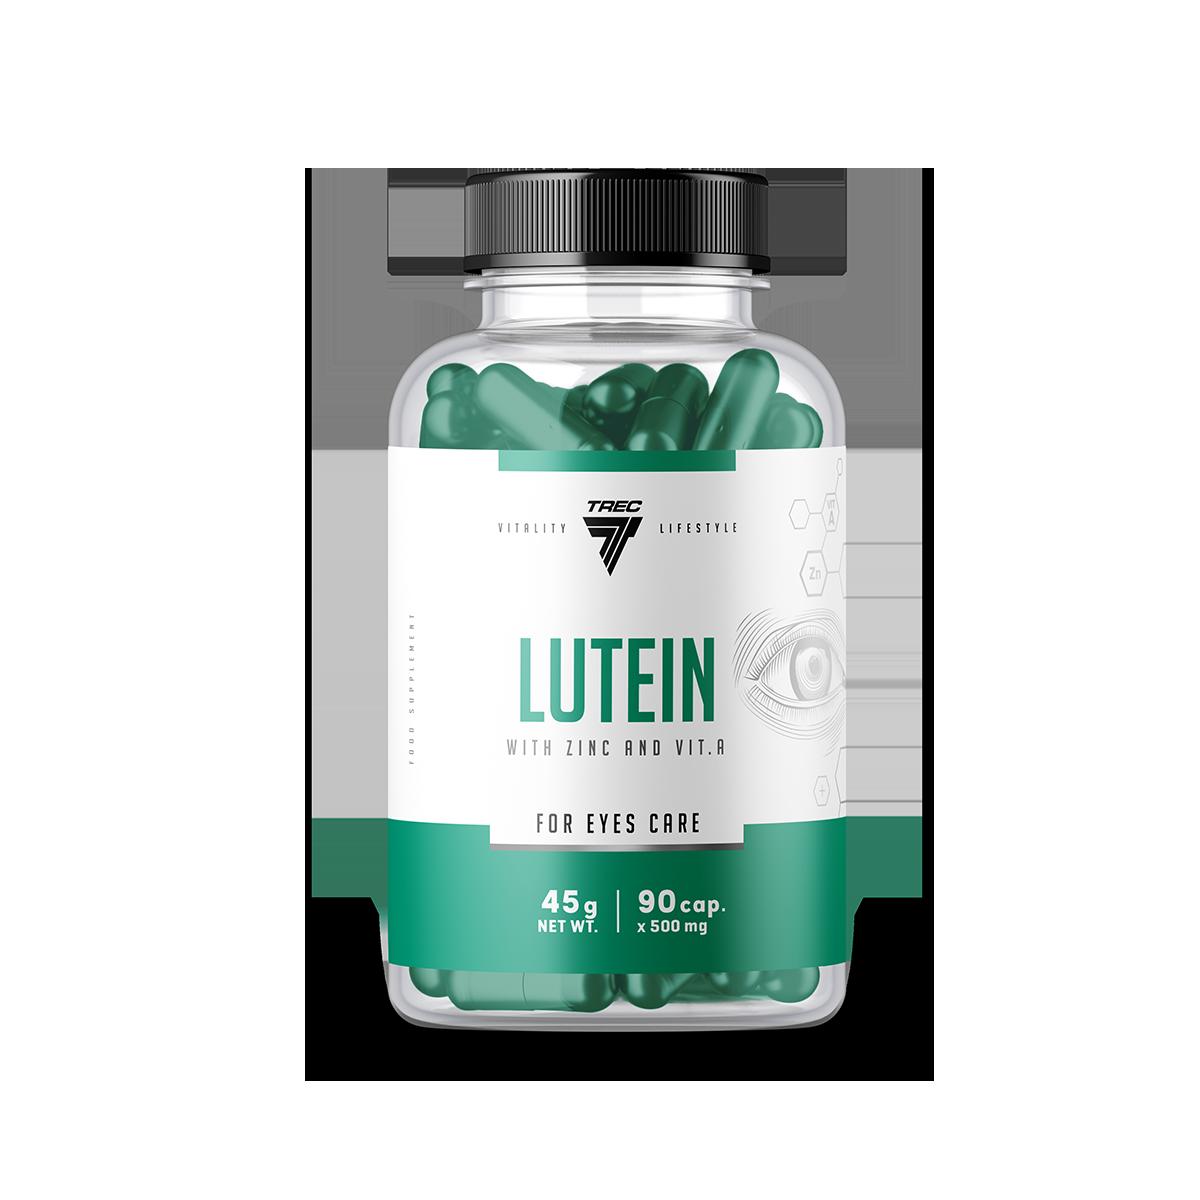 Luteina-Trec-Nutrition